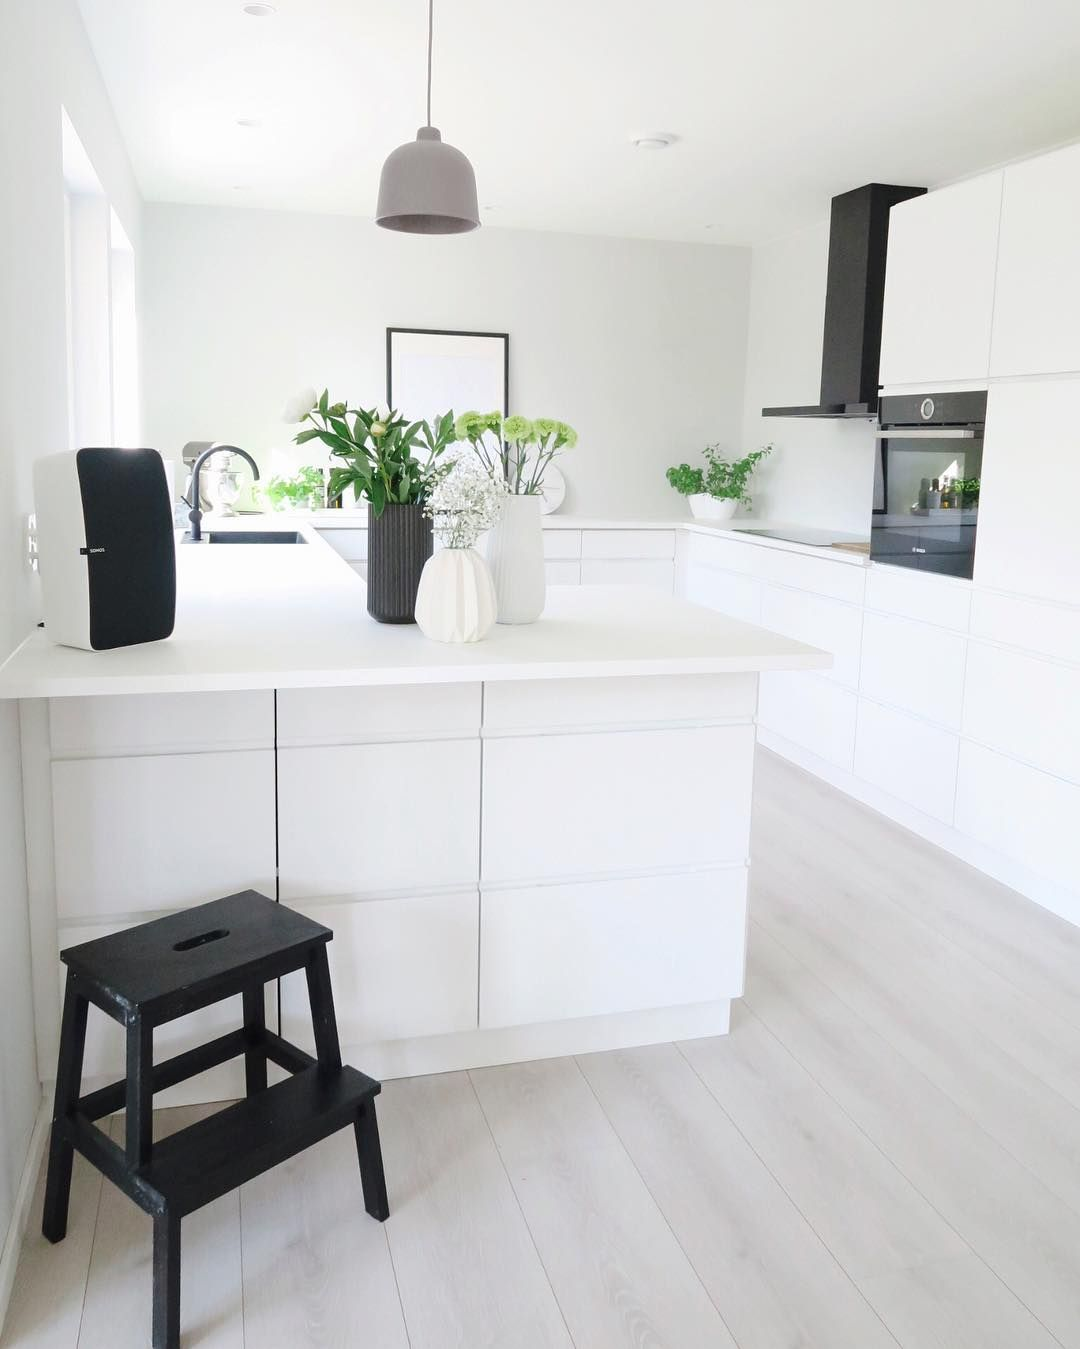 abzugshaube k che pinterest abzugshaube k che und. Black Bedroom Furniture Sets. Home Design Ideas